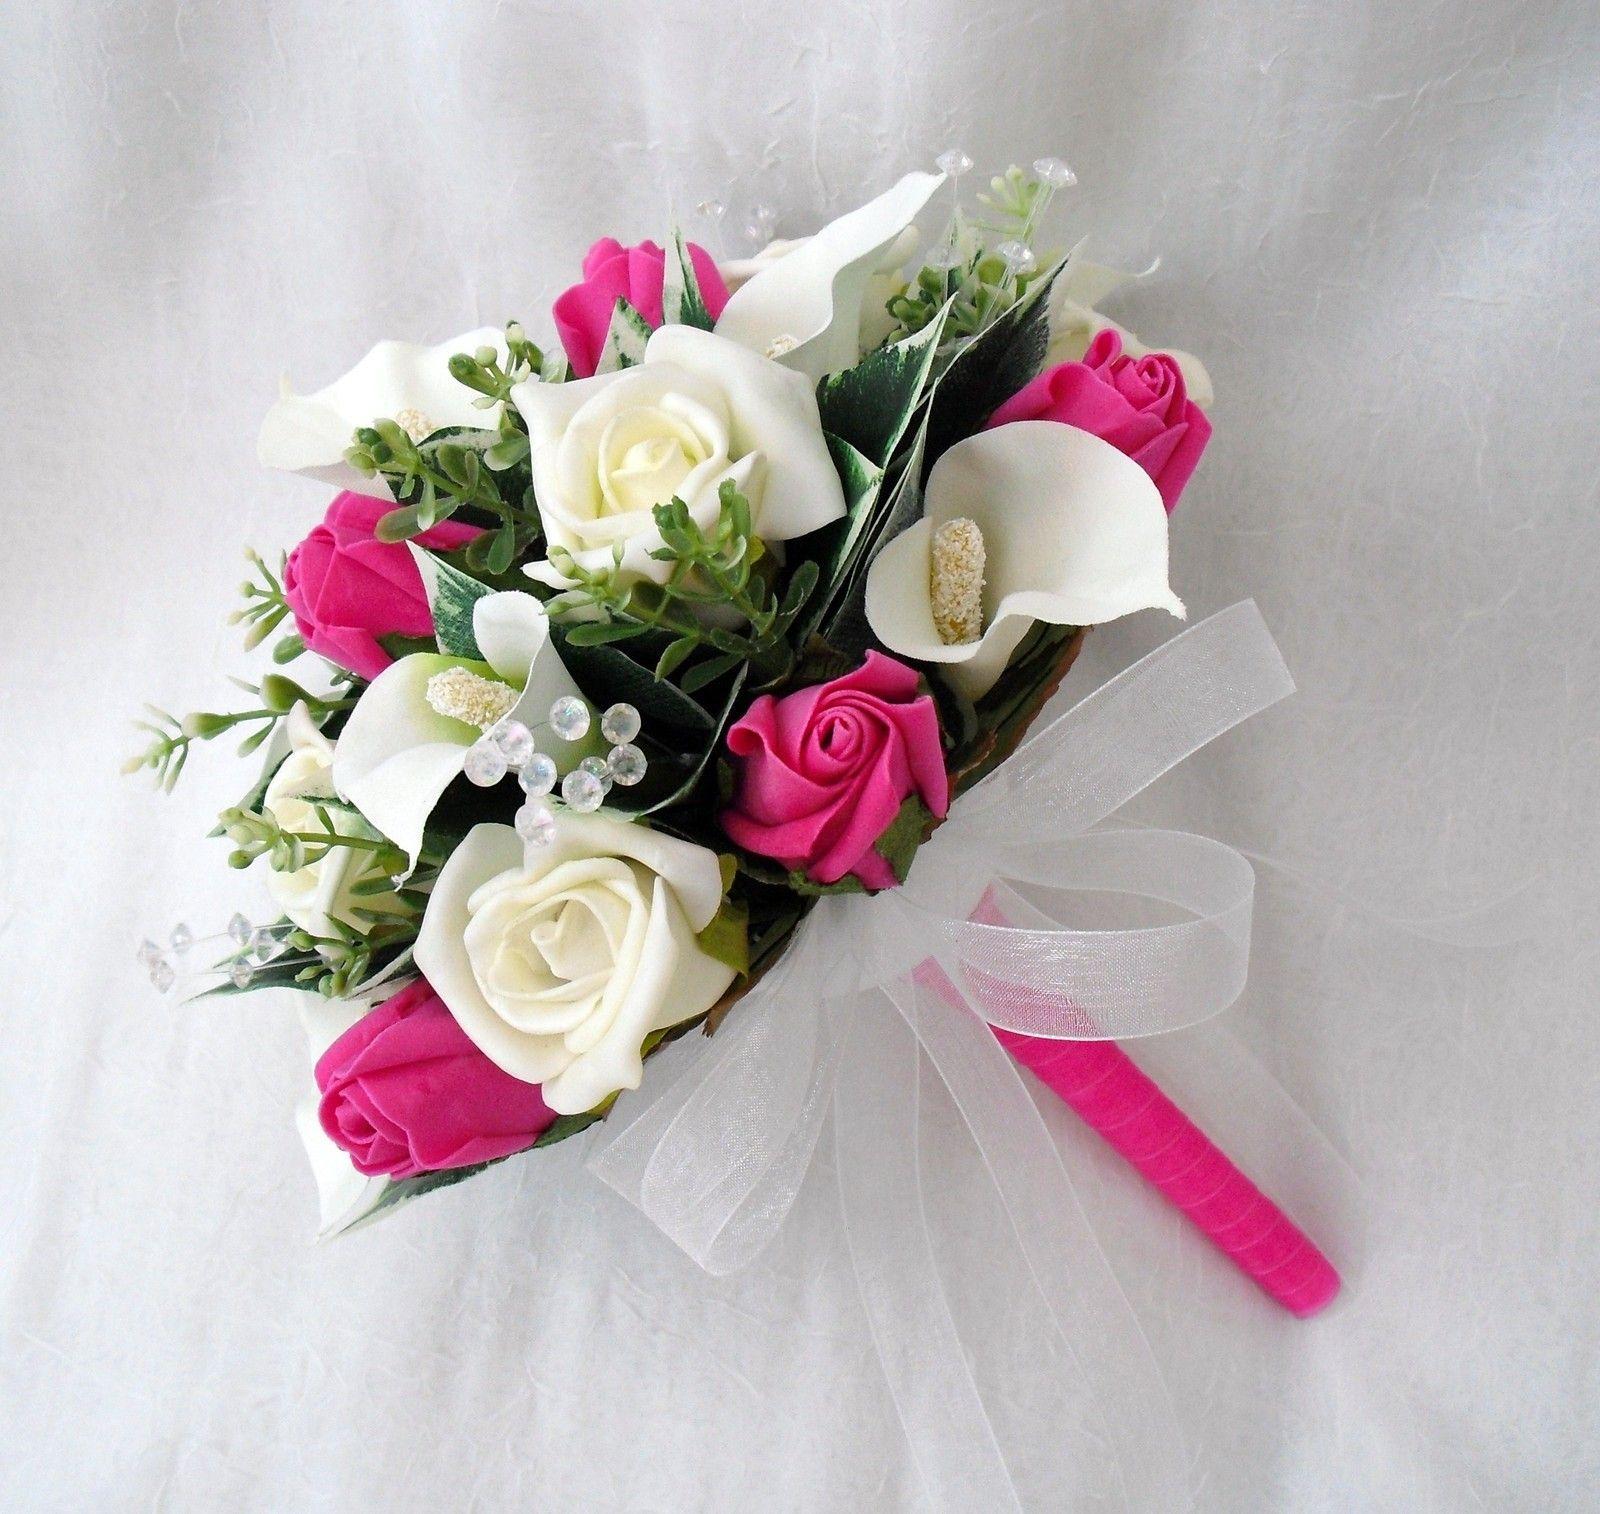 buchet de nunta cu flori albe si roz